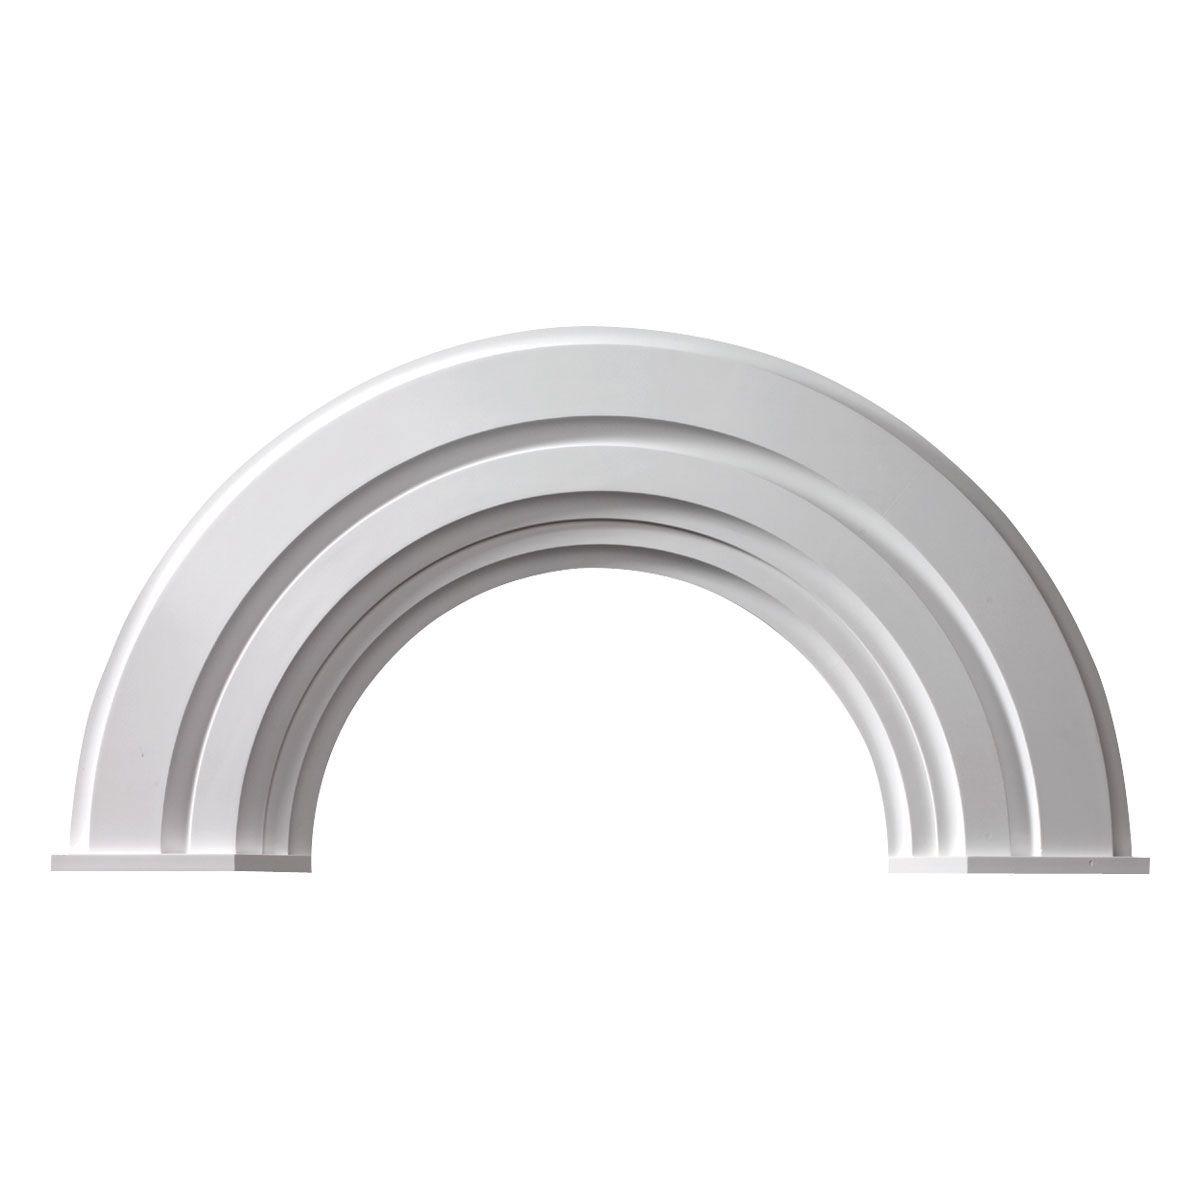 64 Inch Iw X 32 3 4 Inch Ih X 32 Inch Radius Half Round Arch W Decorative Trim End Caps 300 97 Arch Molding Arched Exterior Doors Interior Window Trim